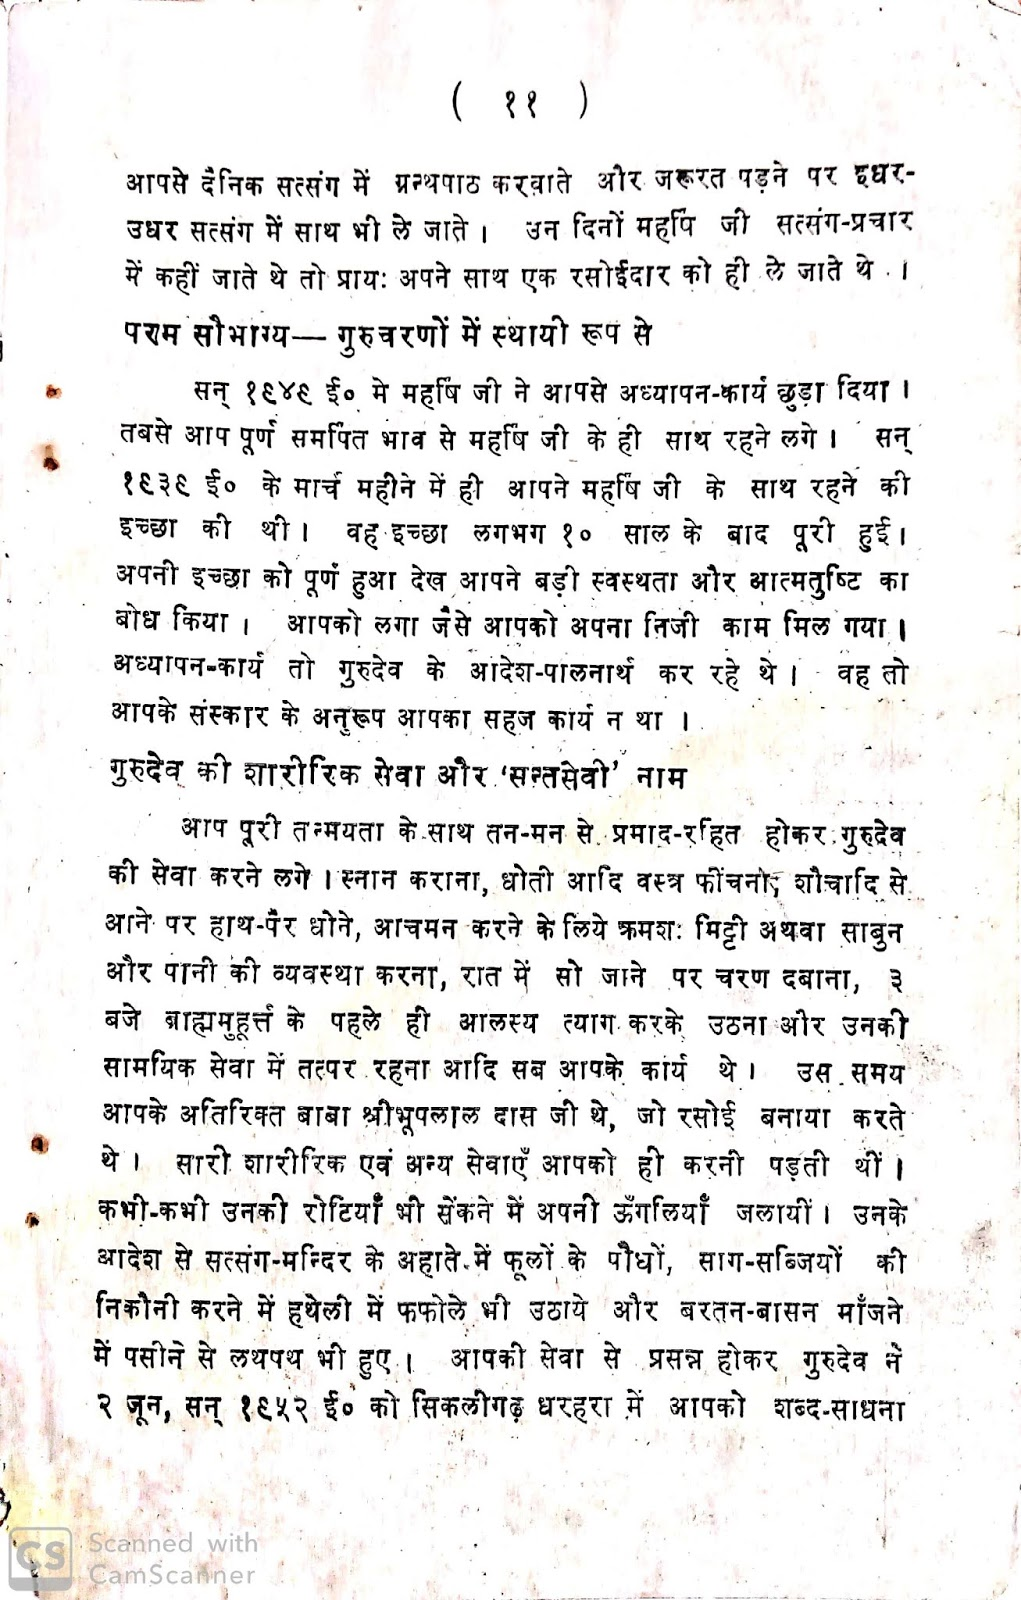 3 पूज्य पाद संतसेवी जी महाराज का परिचय। Brief introduction of Pujya Pad Santsevi Ji Maharaj। संतसेवी परिचय चित्र 11